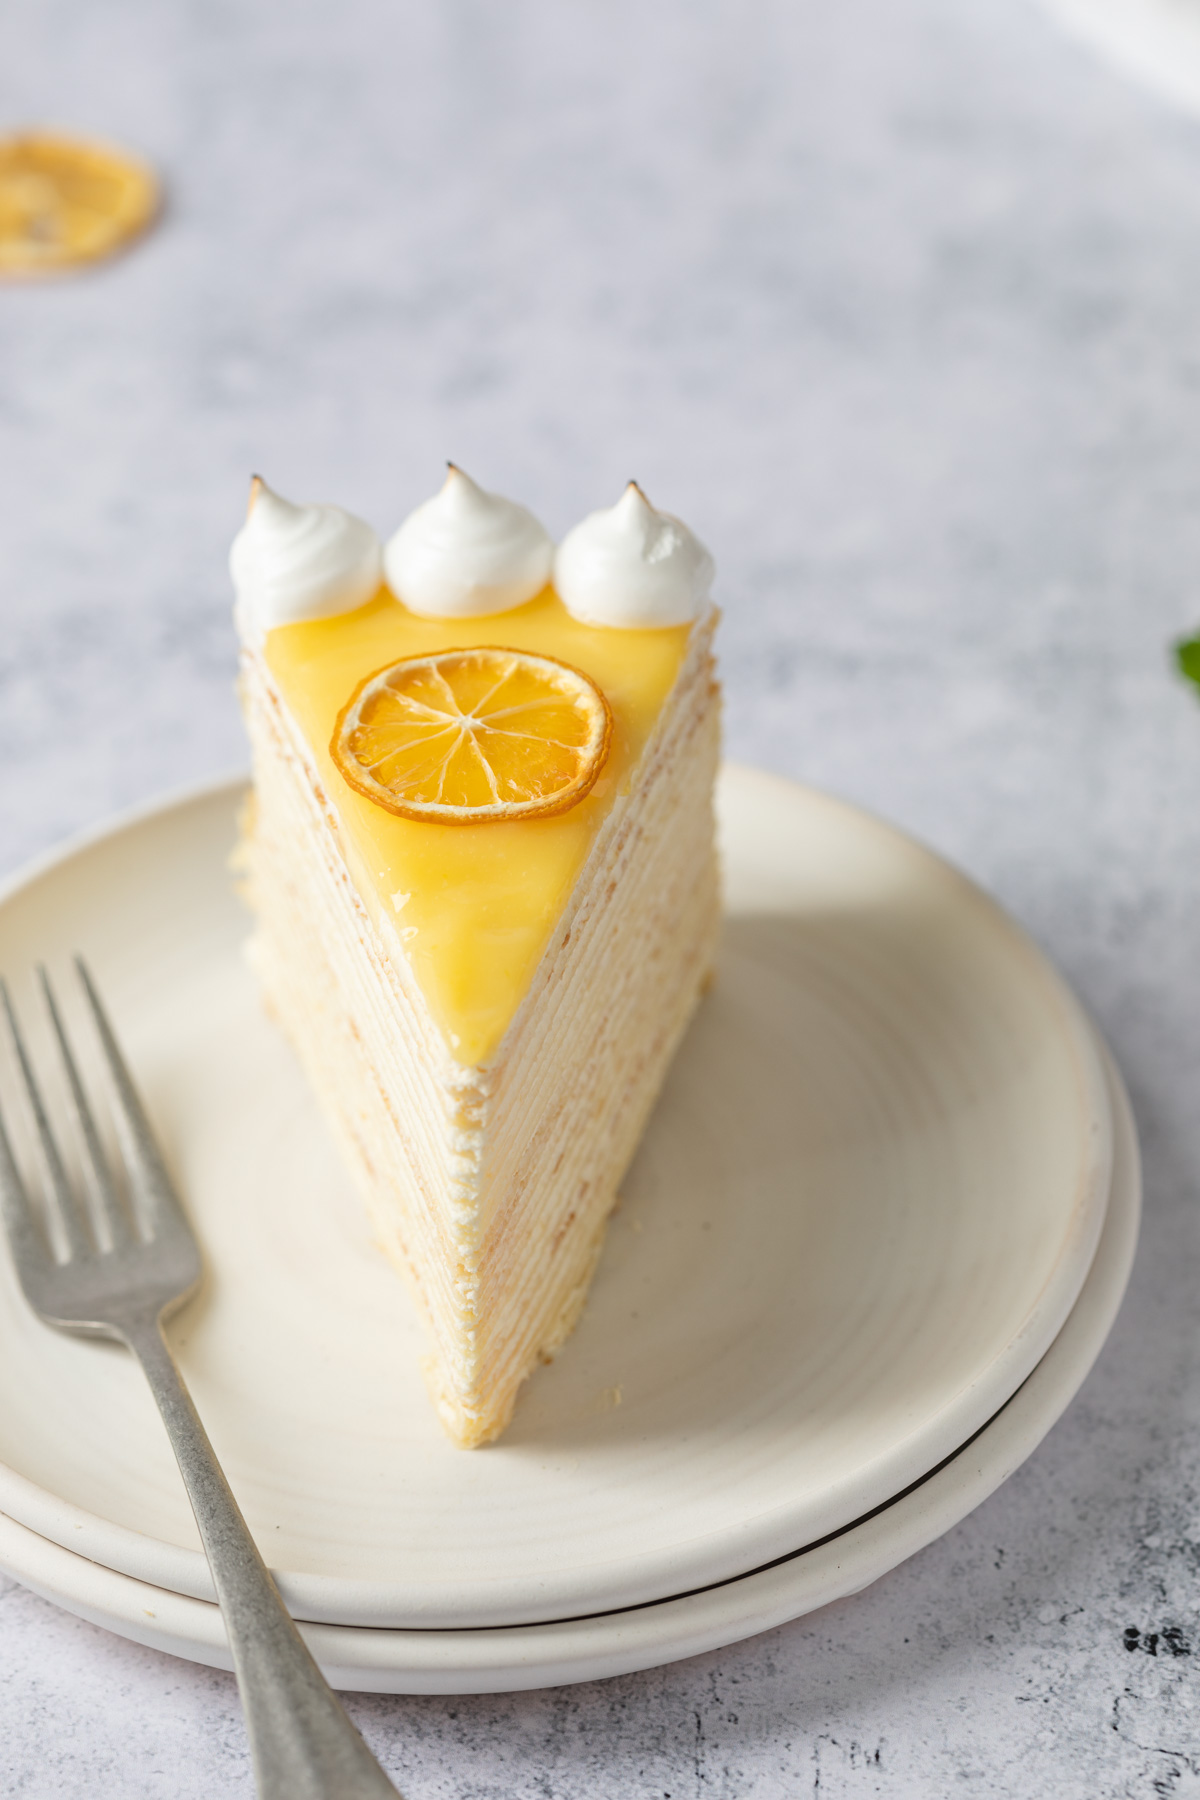 slice of lemon crepe cake with lemon curd and italian meringue